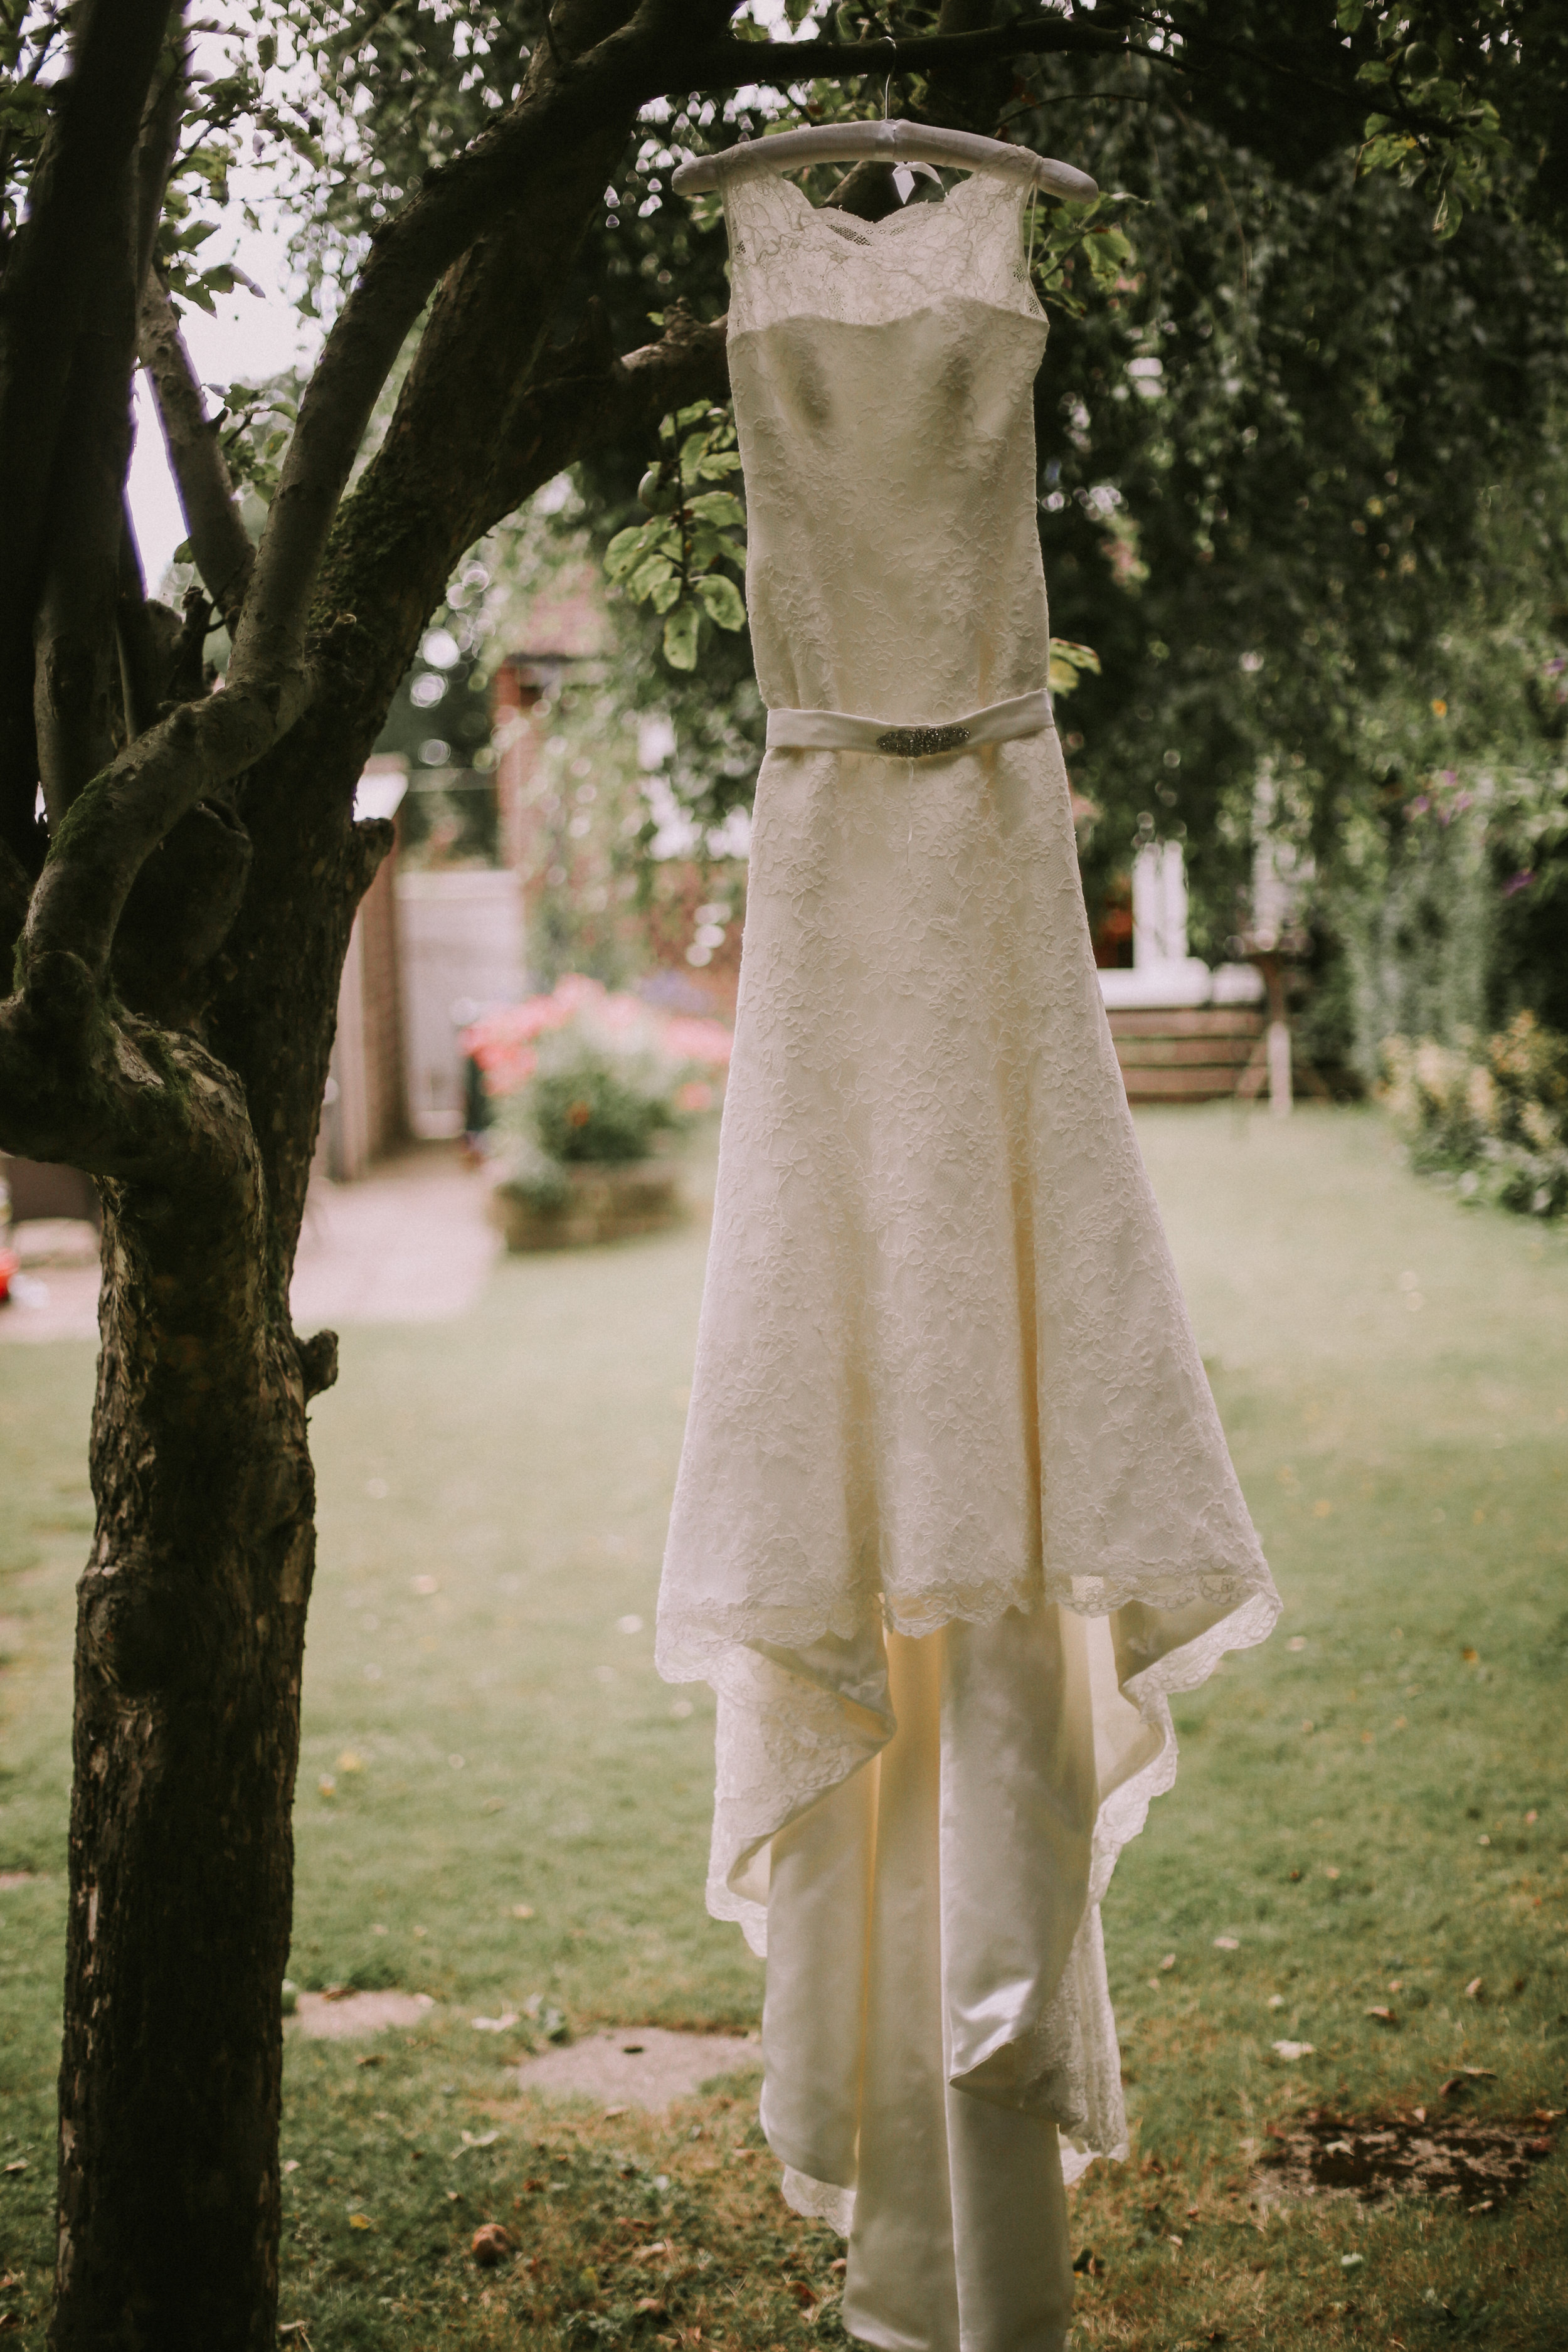 reigate-surrey-london-wedding-photography-bridal-prep-dress-07